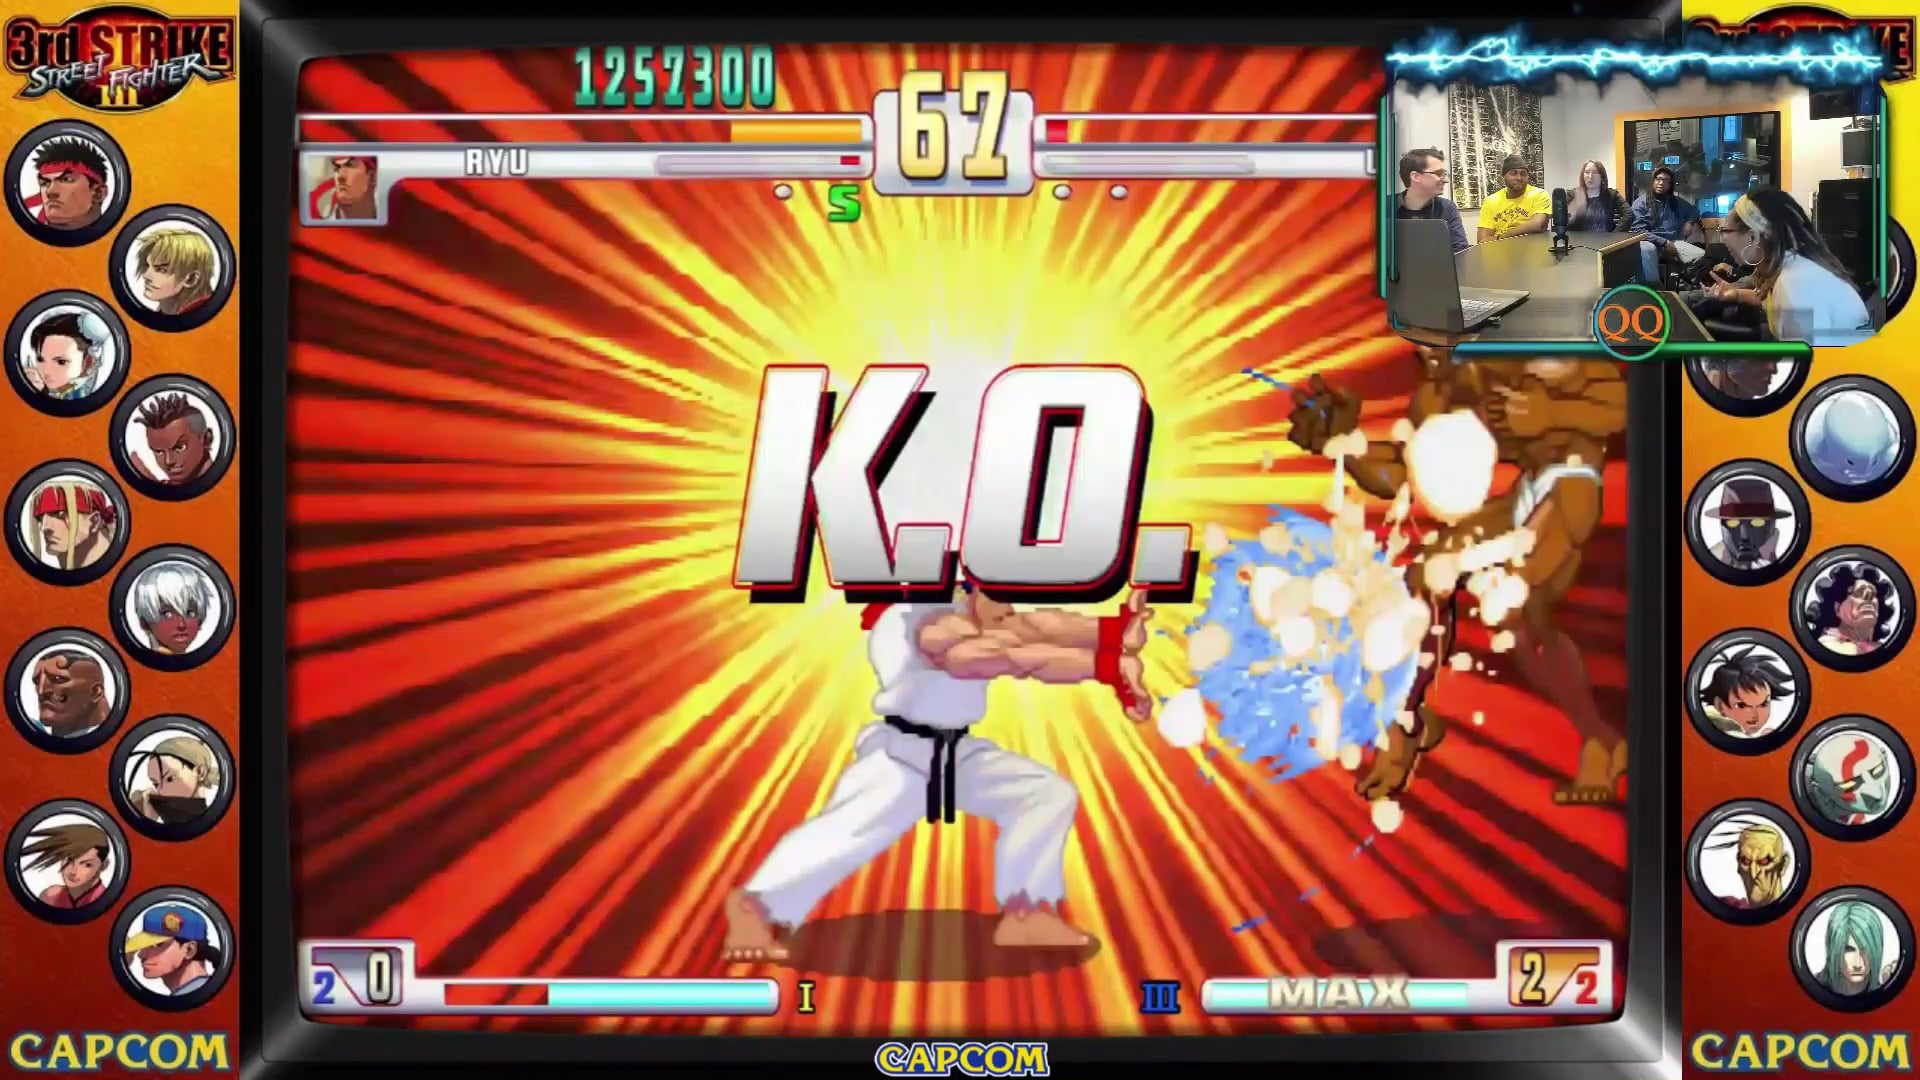 Quarter Queue - Street Fighter pt.2 (short)